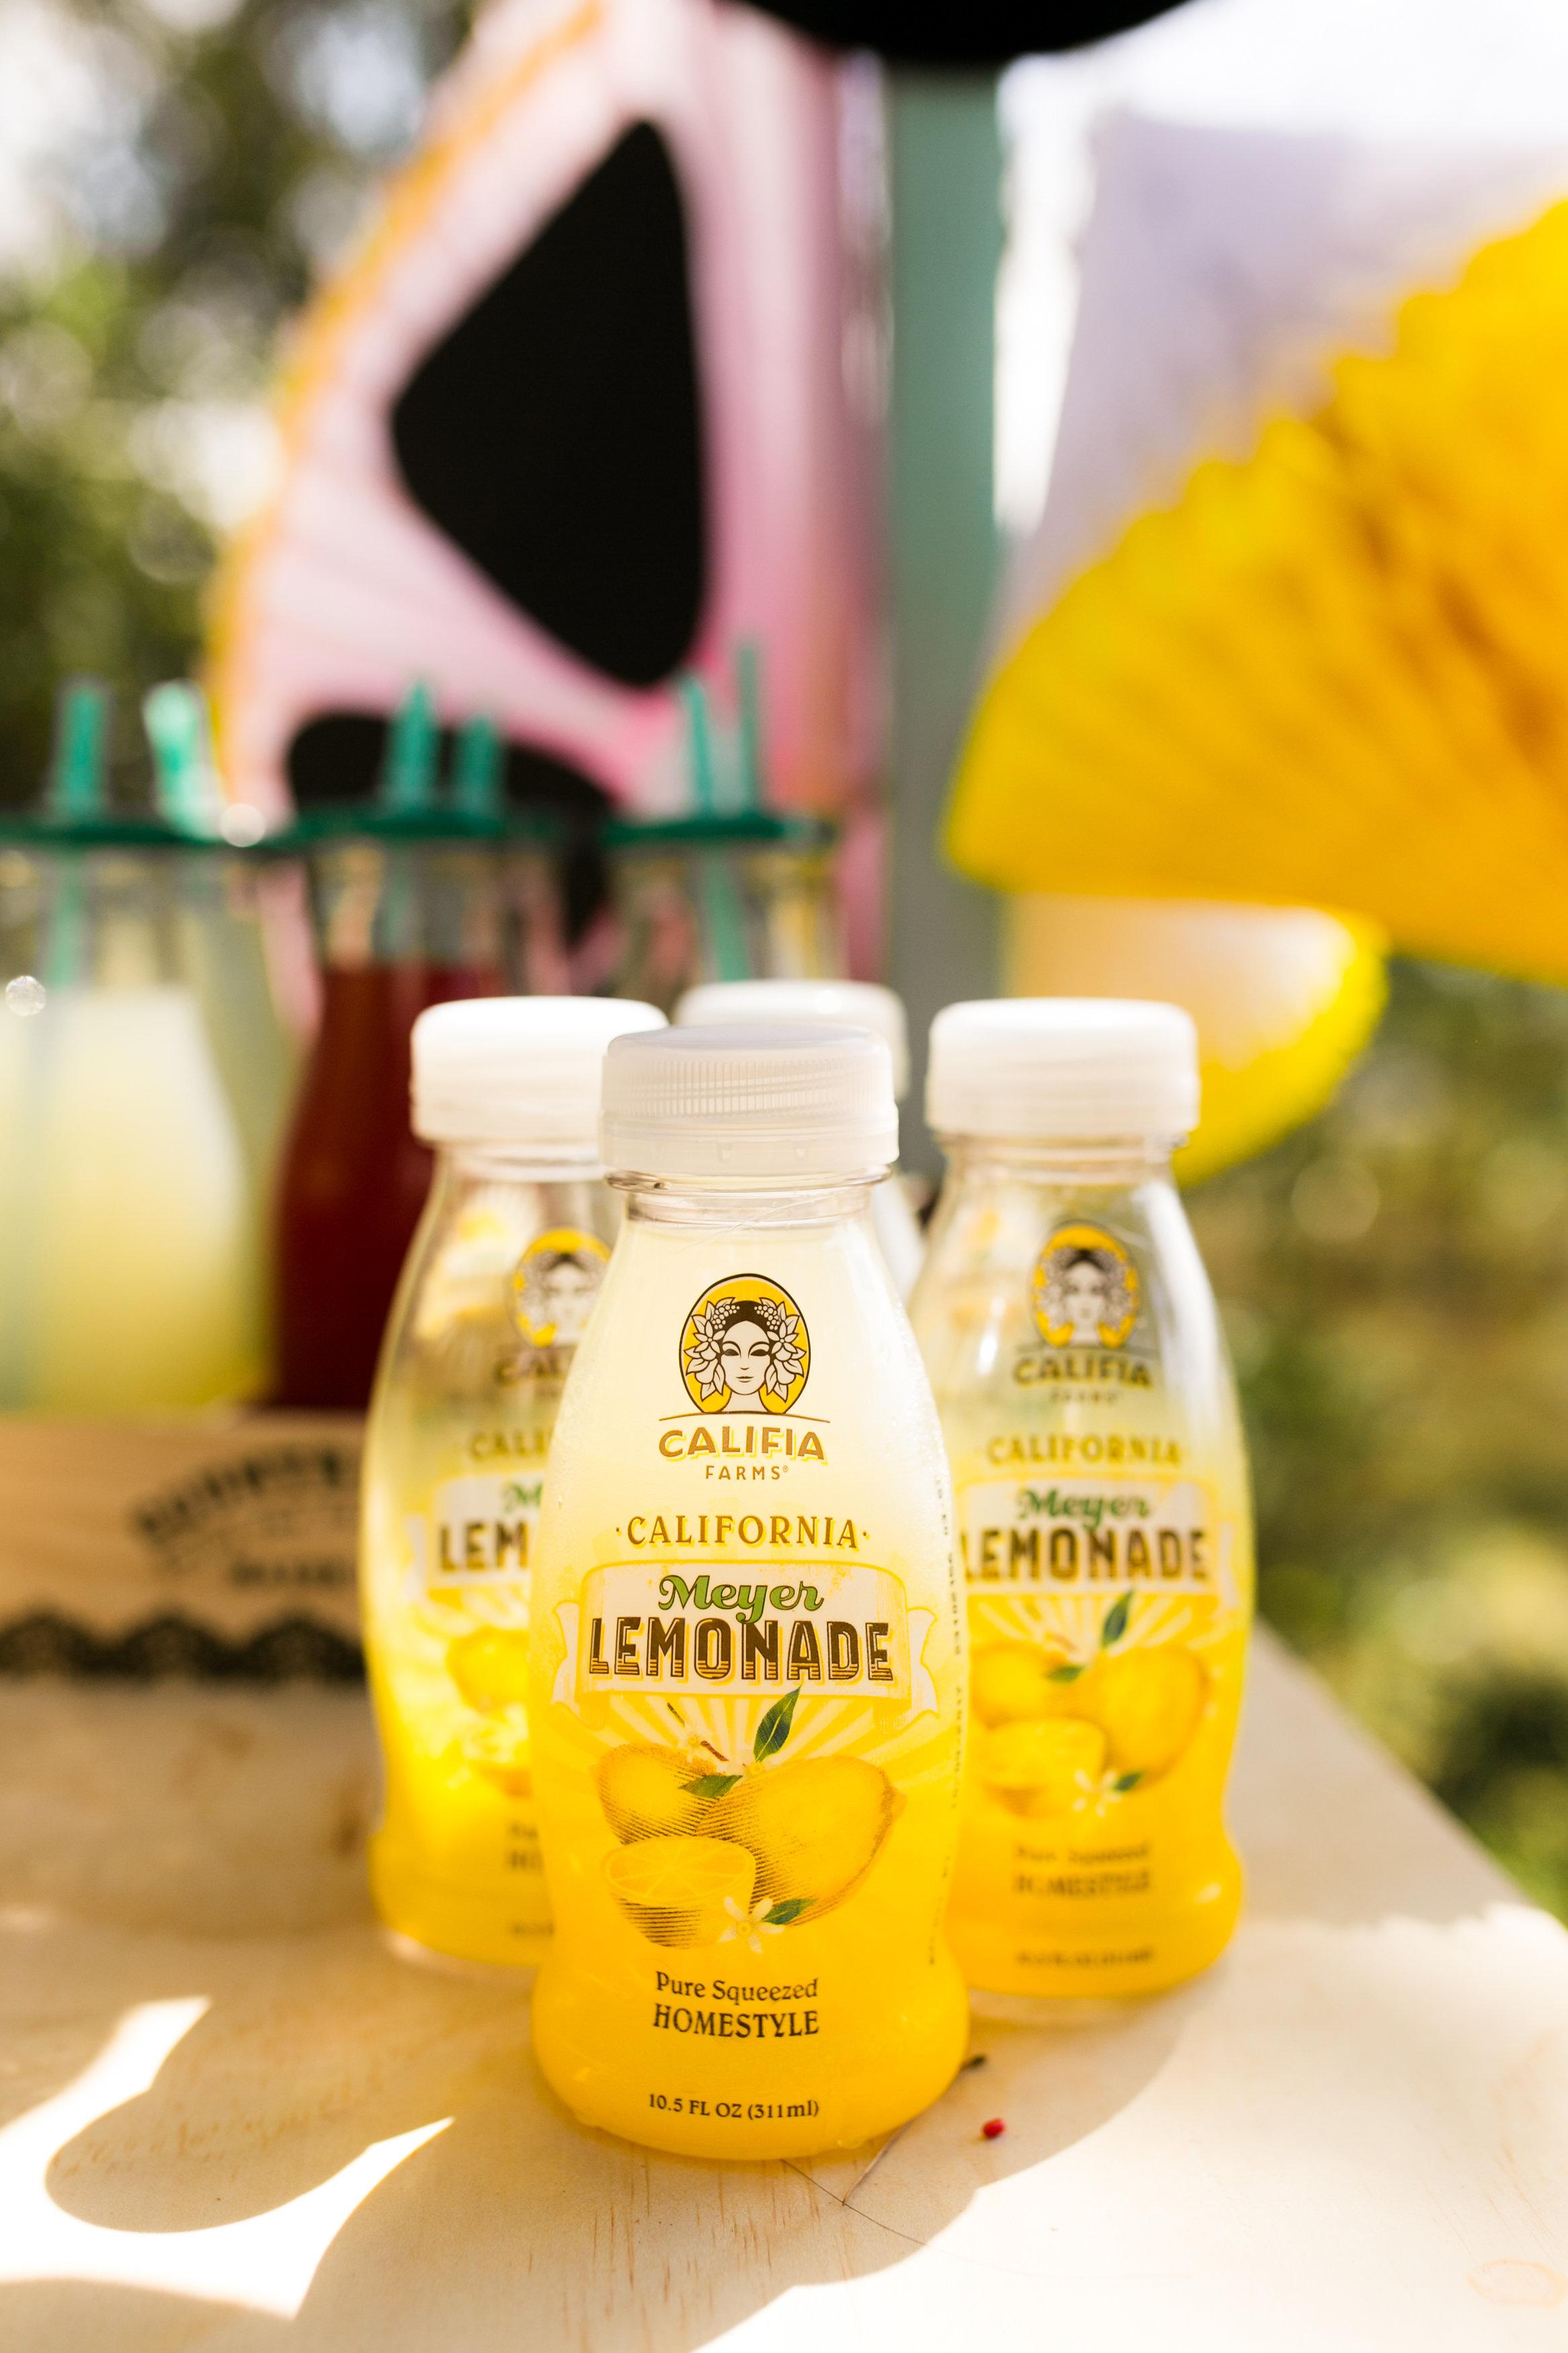 Lemonade Stand Kids Birthday Party - Lemonade provided by Califia Farms